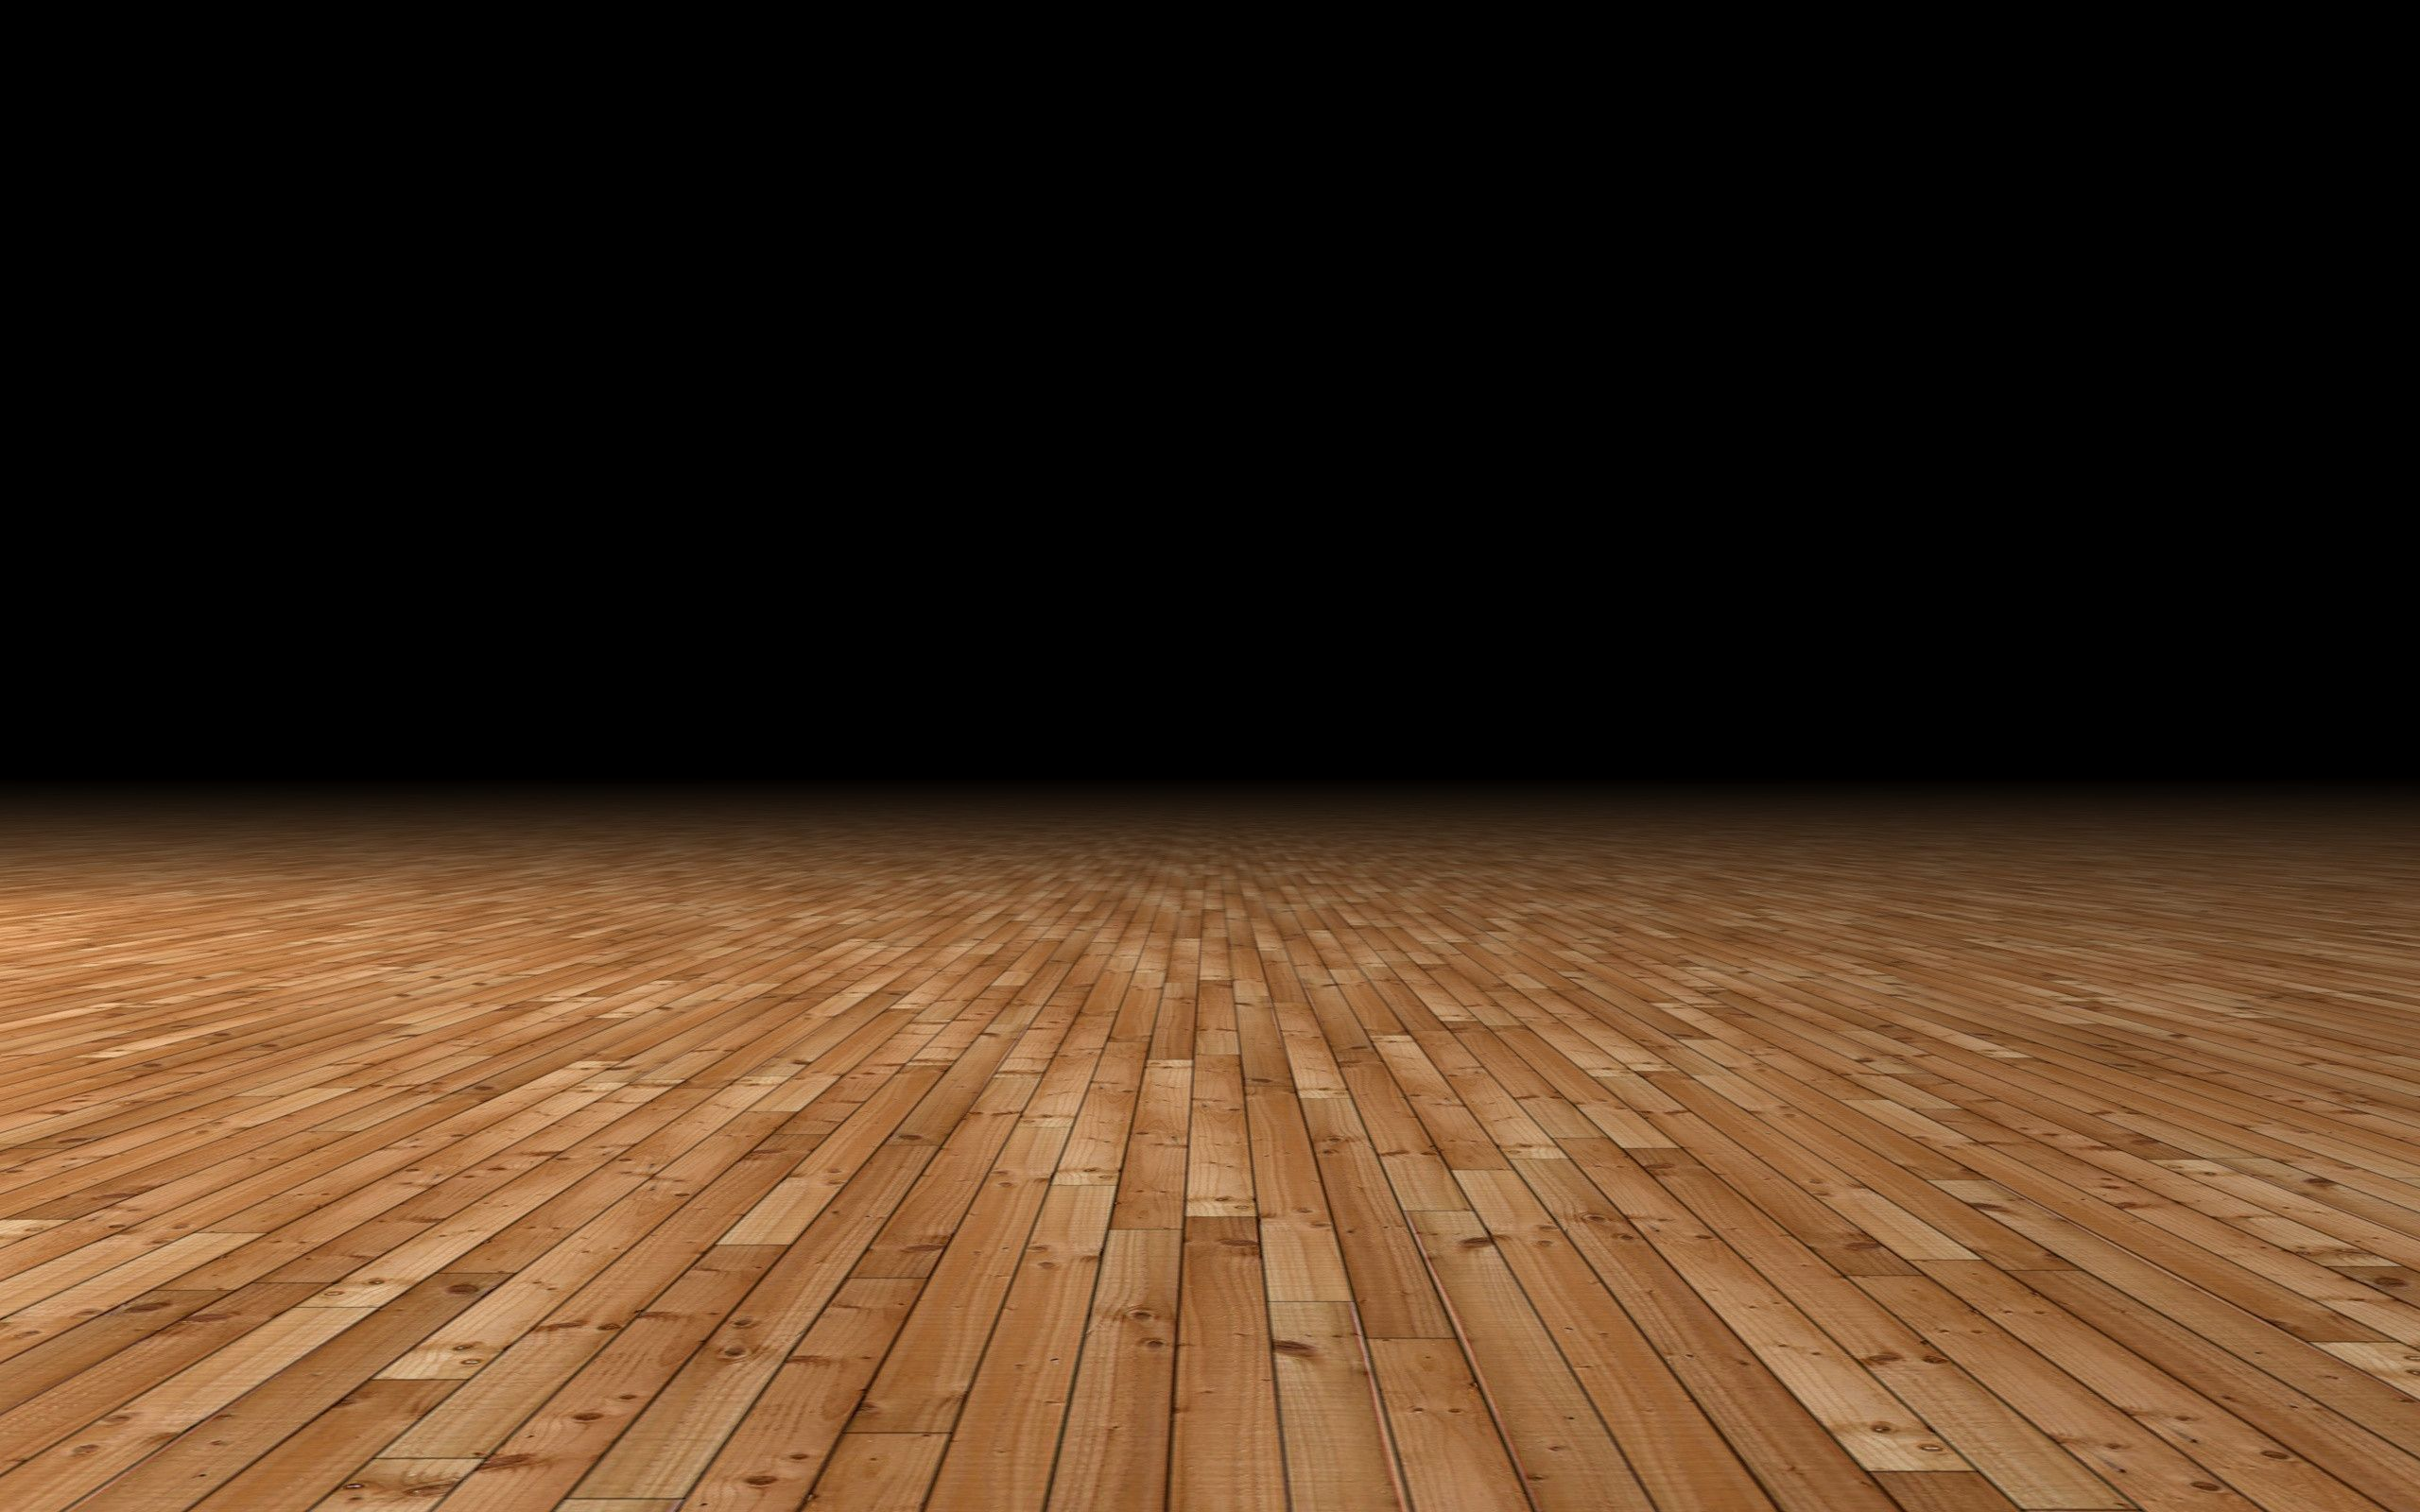 Basketball Court PNG HD - 122773